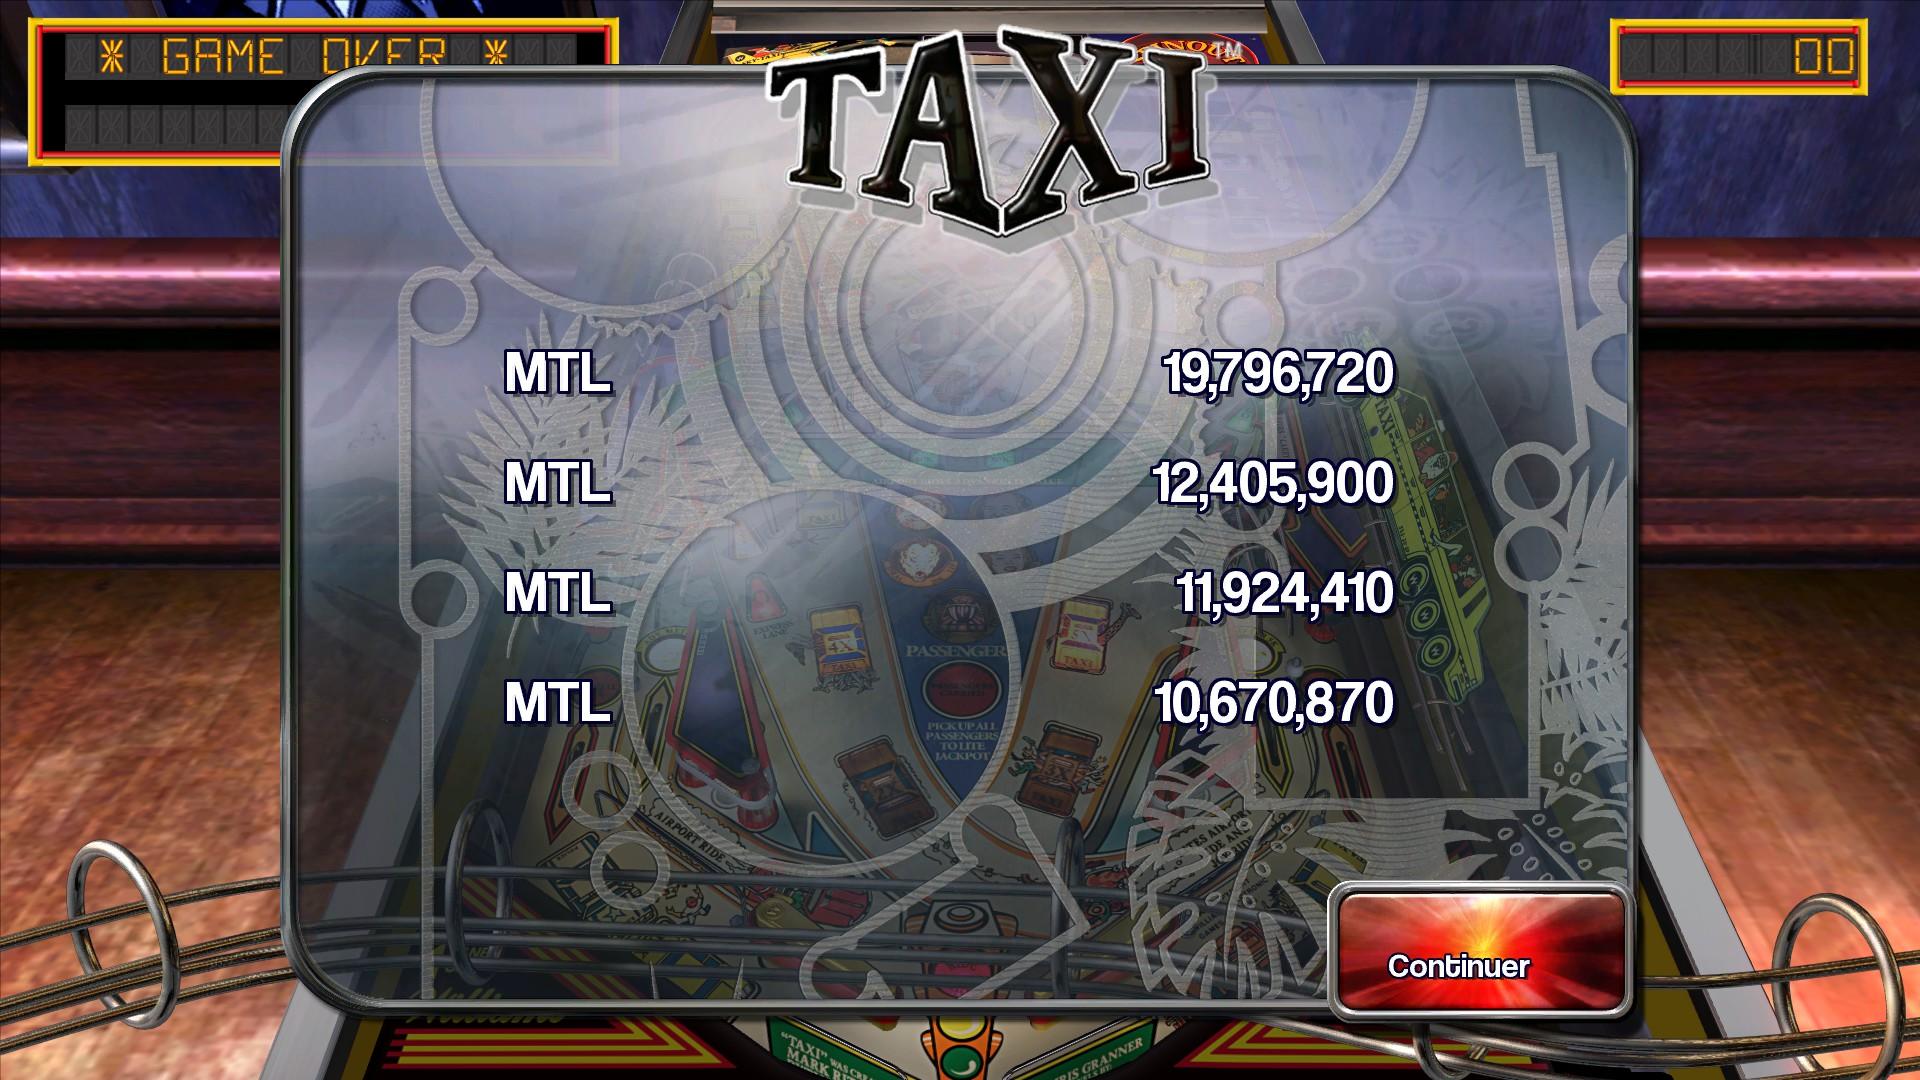 Mantalow: Pinball Arcade: Taxi (PC) 19,796,720 points on 2016-01-08 06:57:00